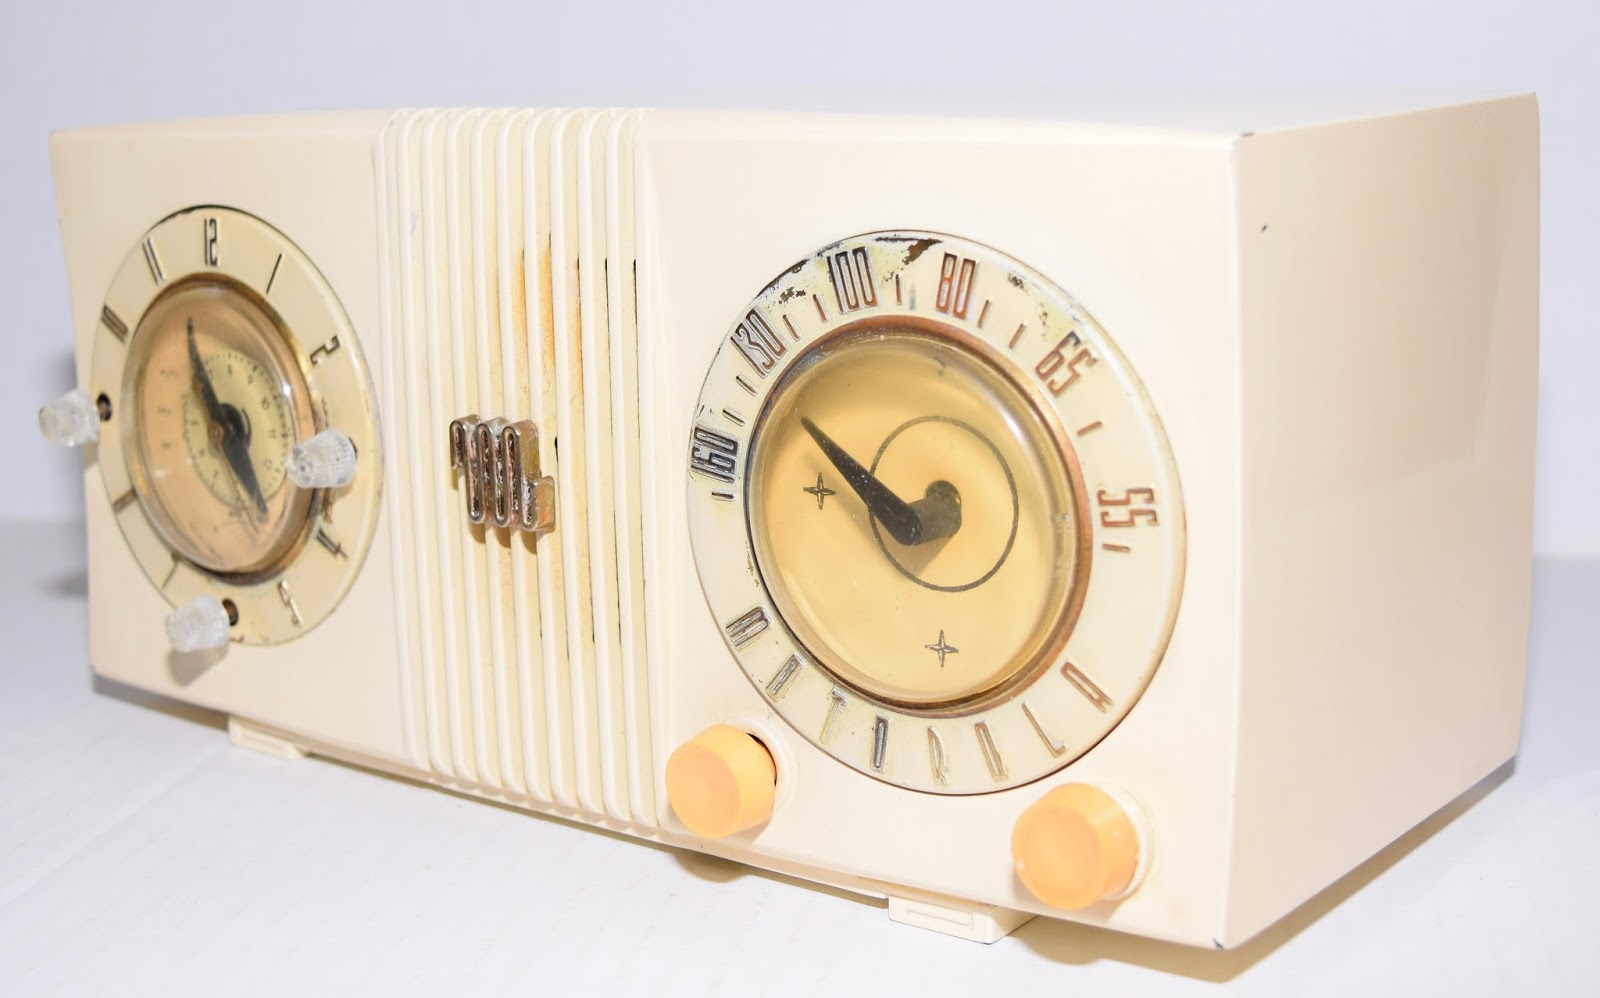 American Radio Design Deco Mid Century Retro Styled